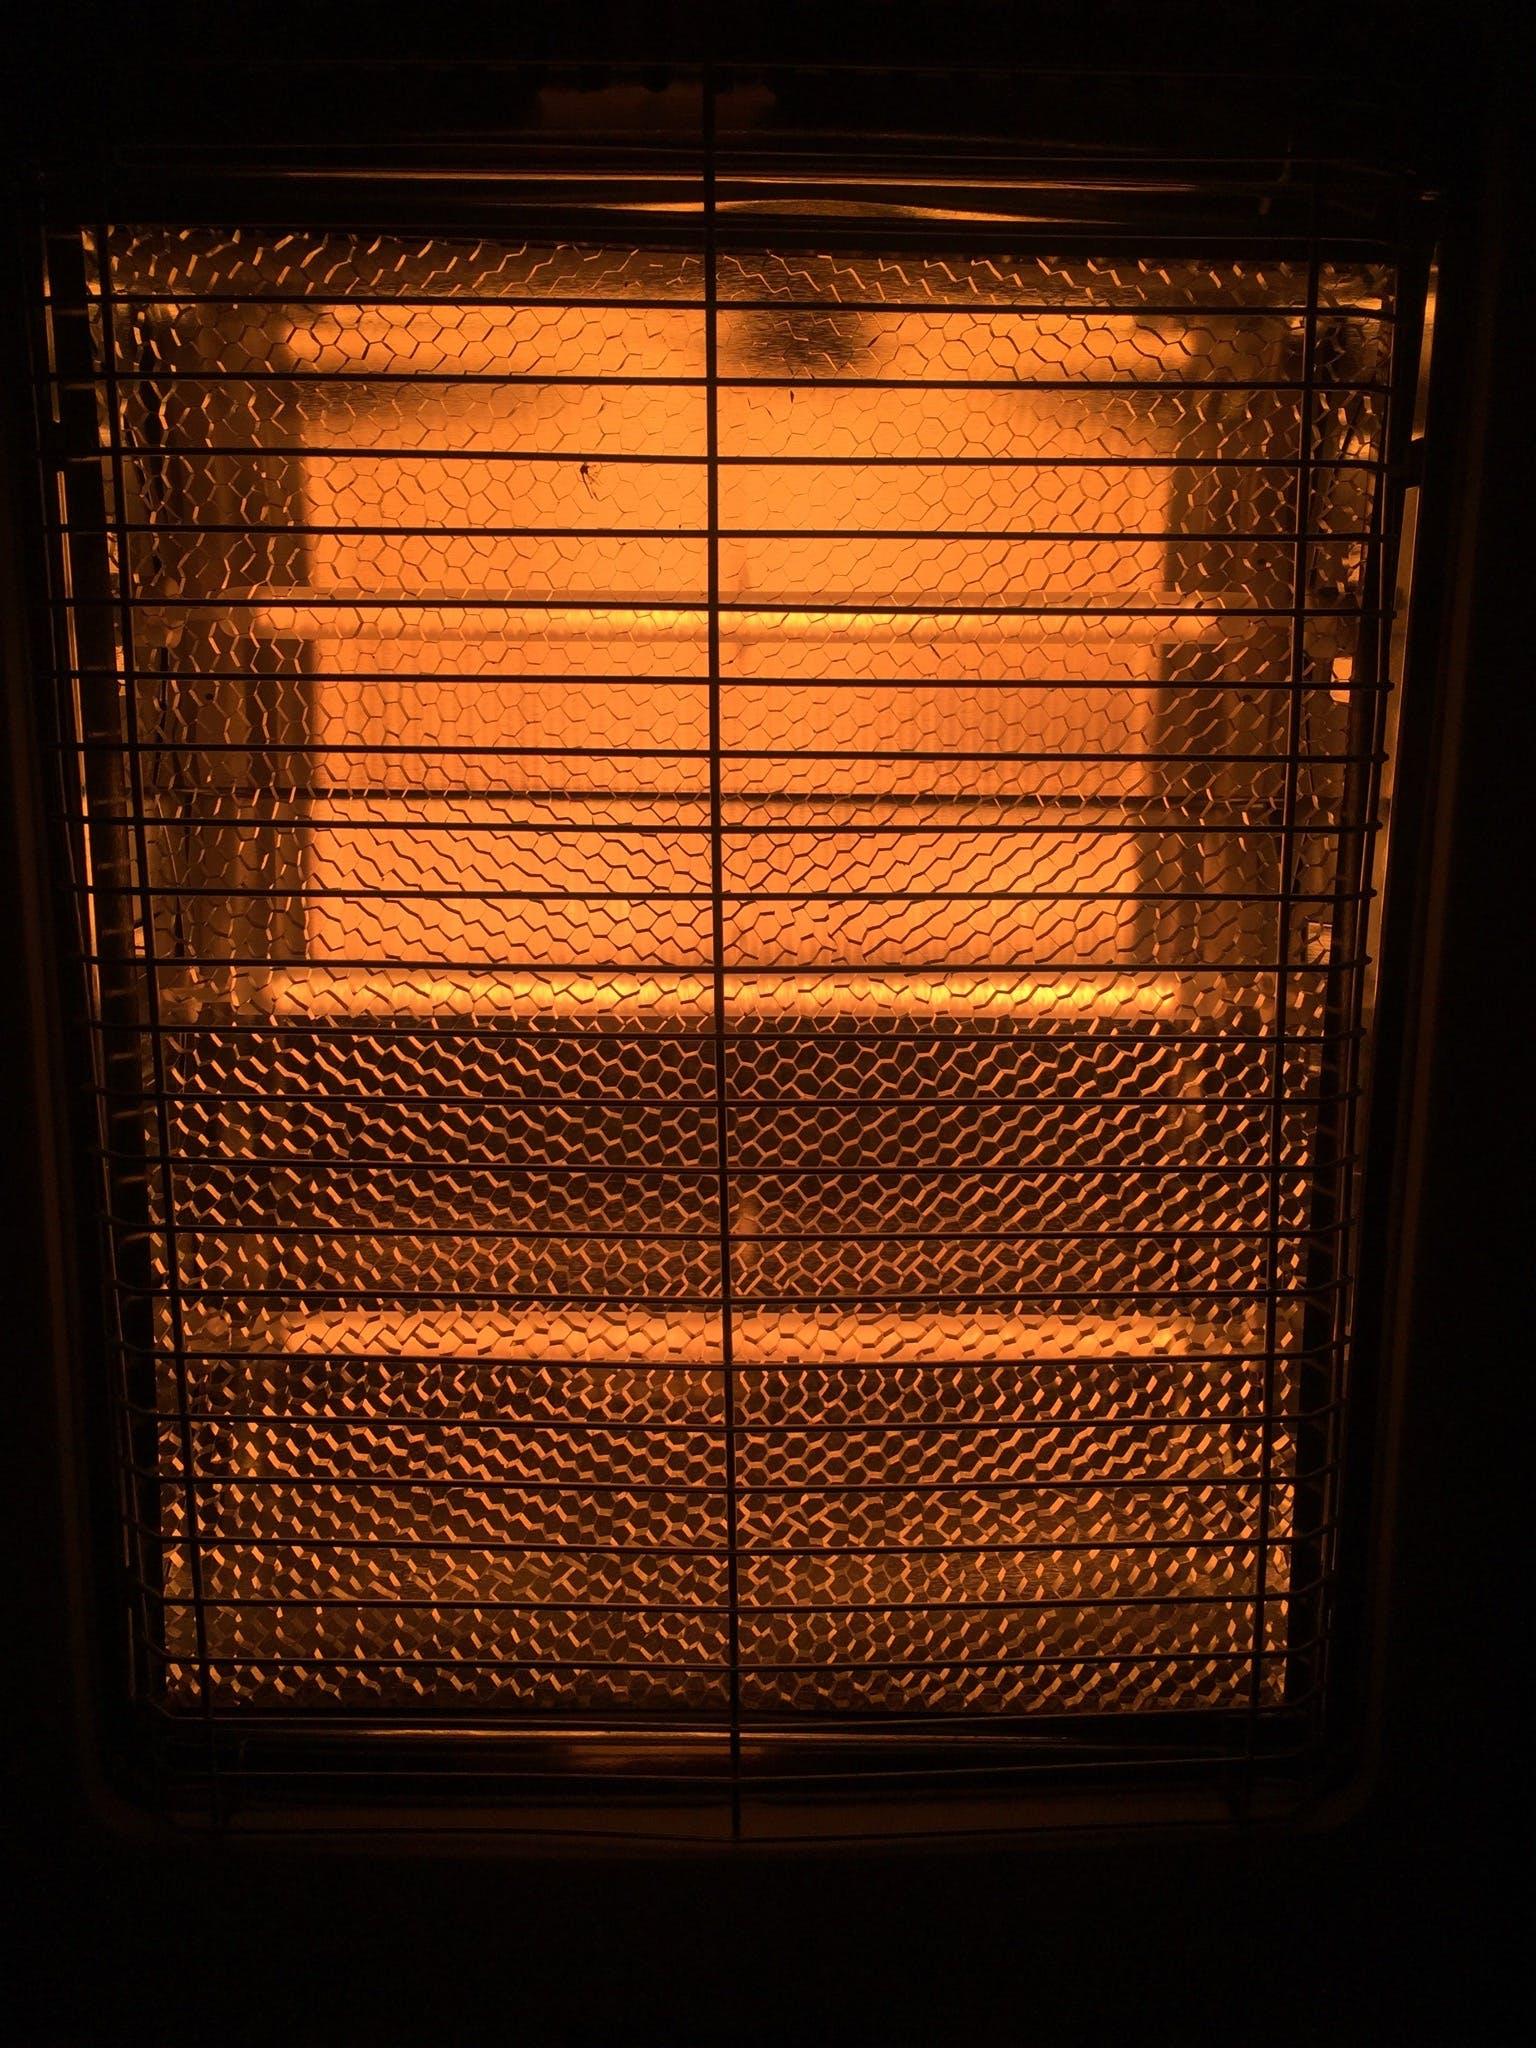 Free stock photo of energy, heat, warmth